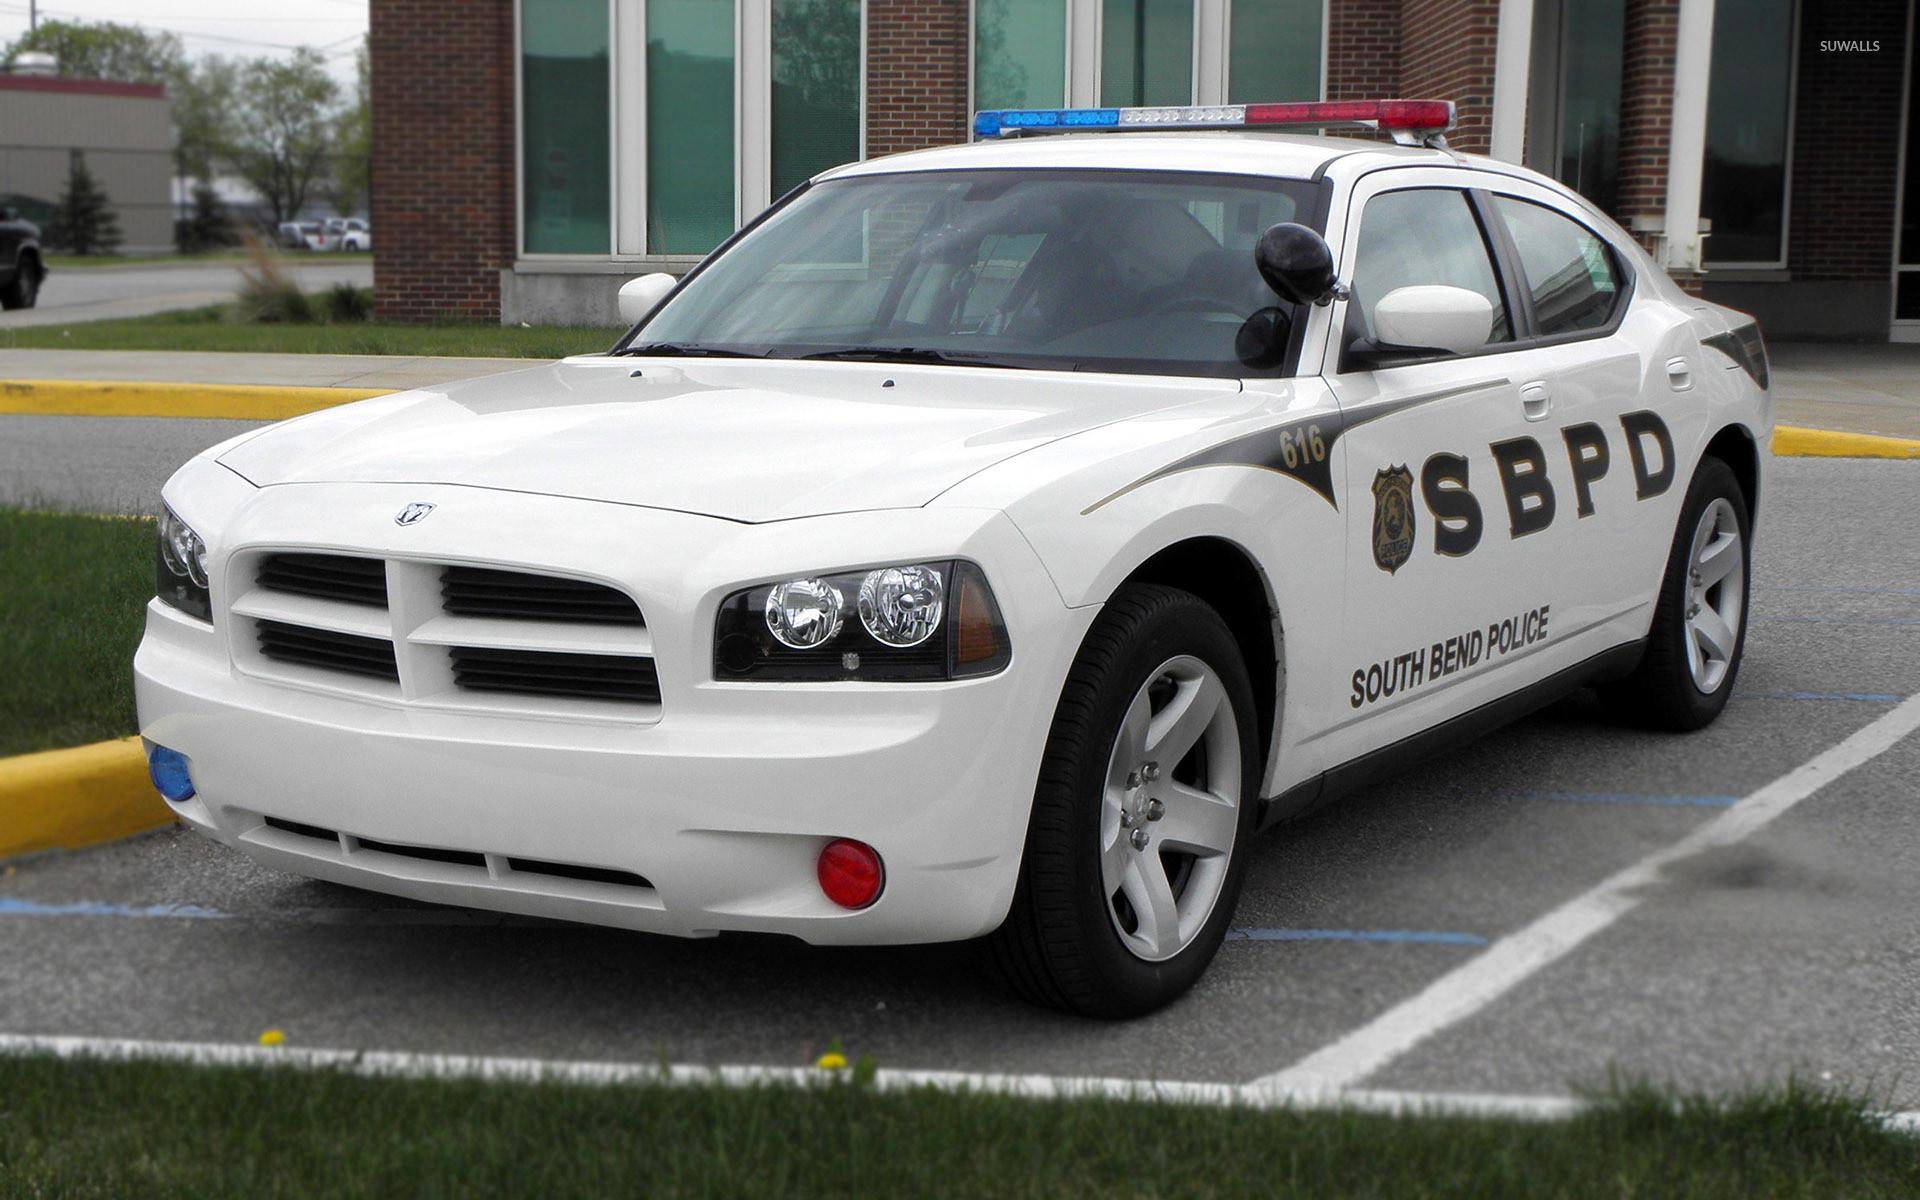 2009 Dodge Charger Police car wallpaper jpg